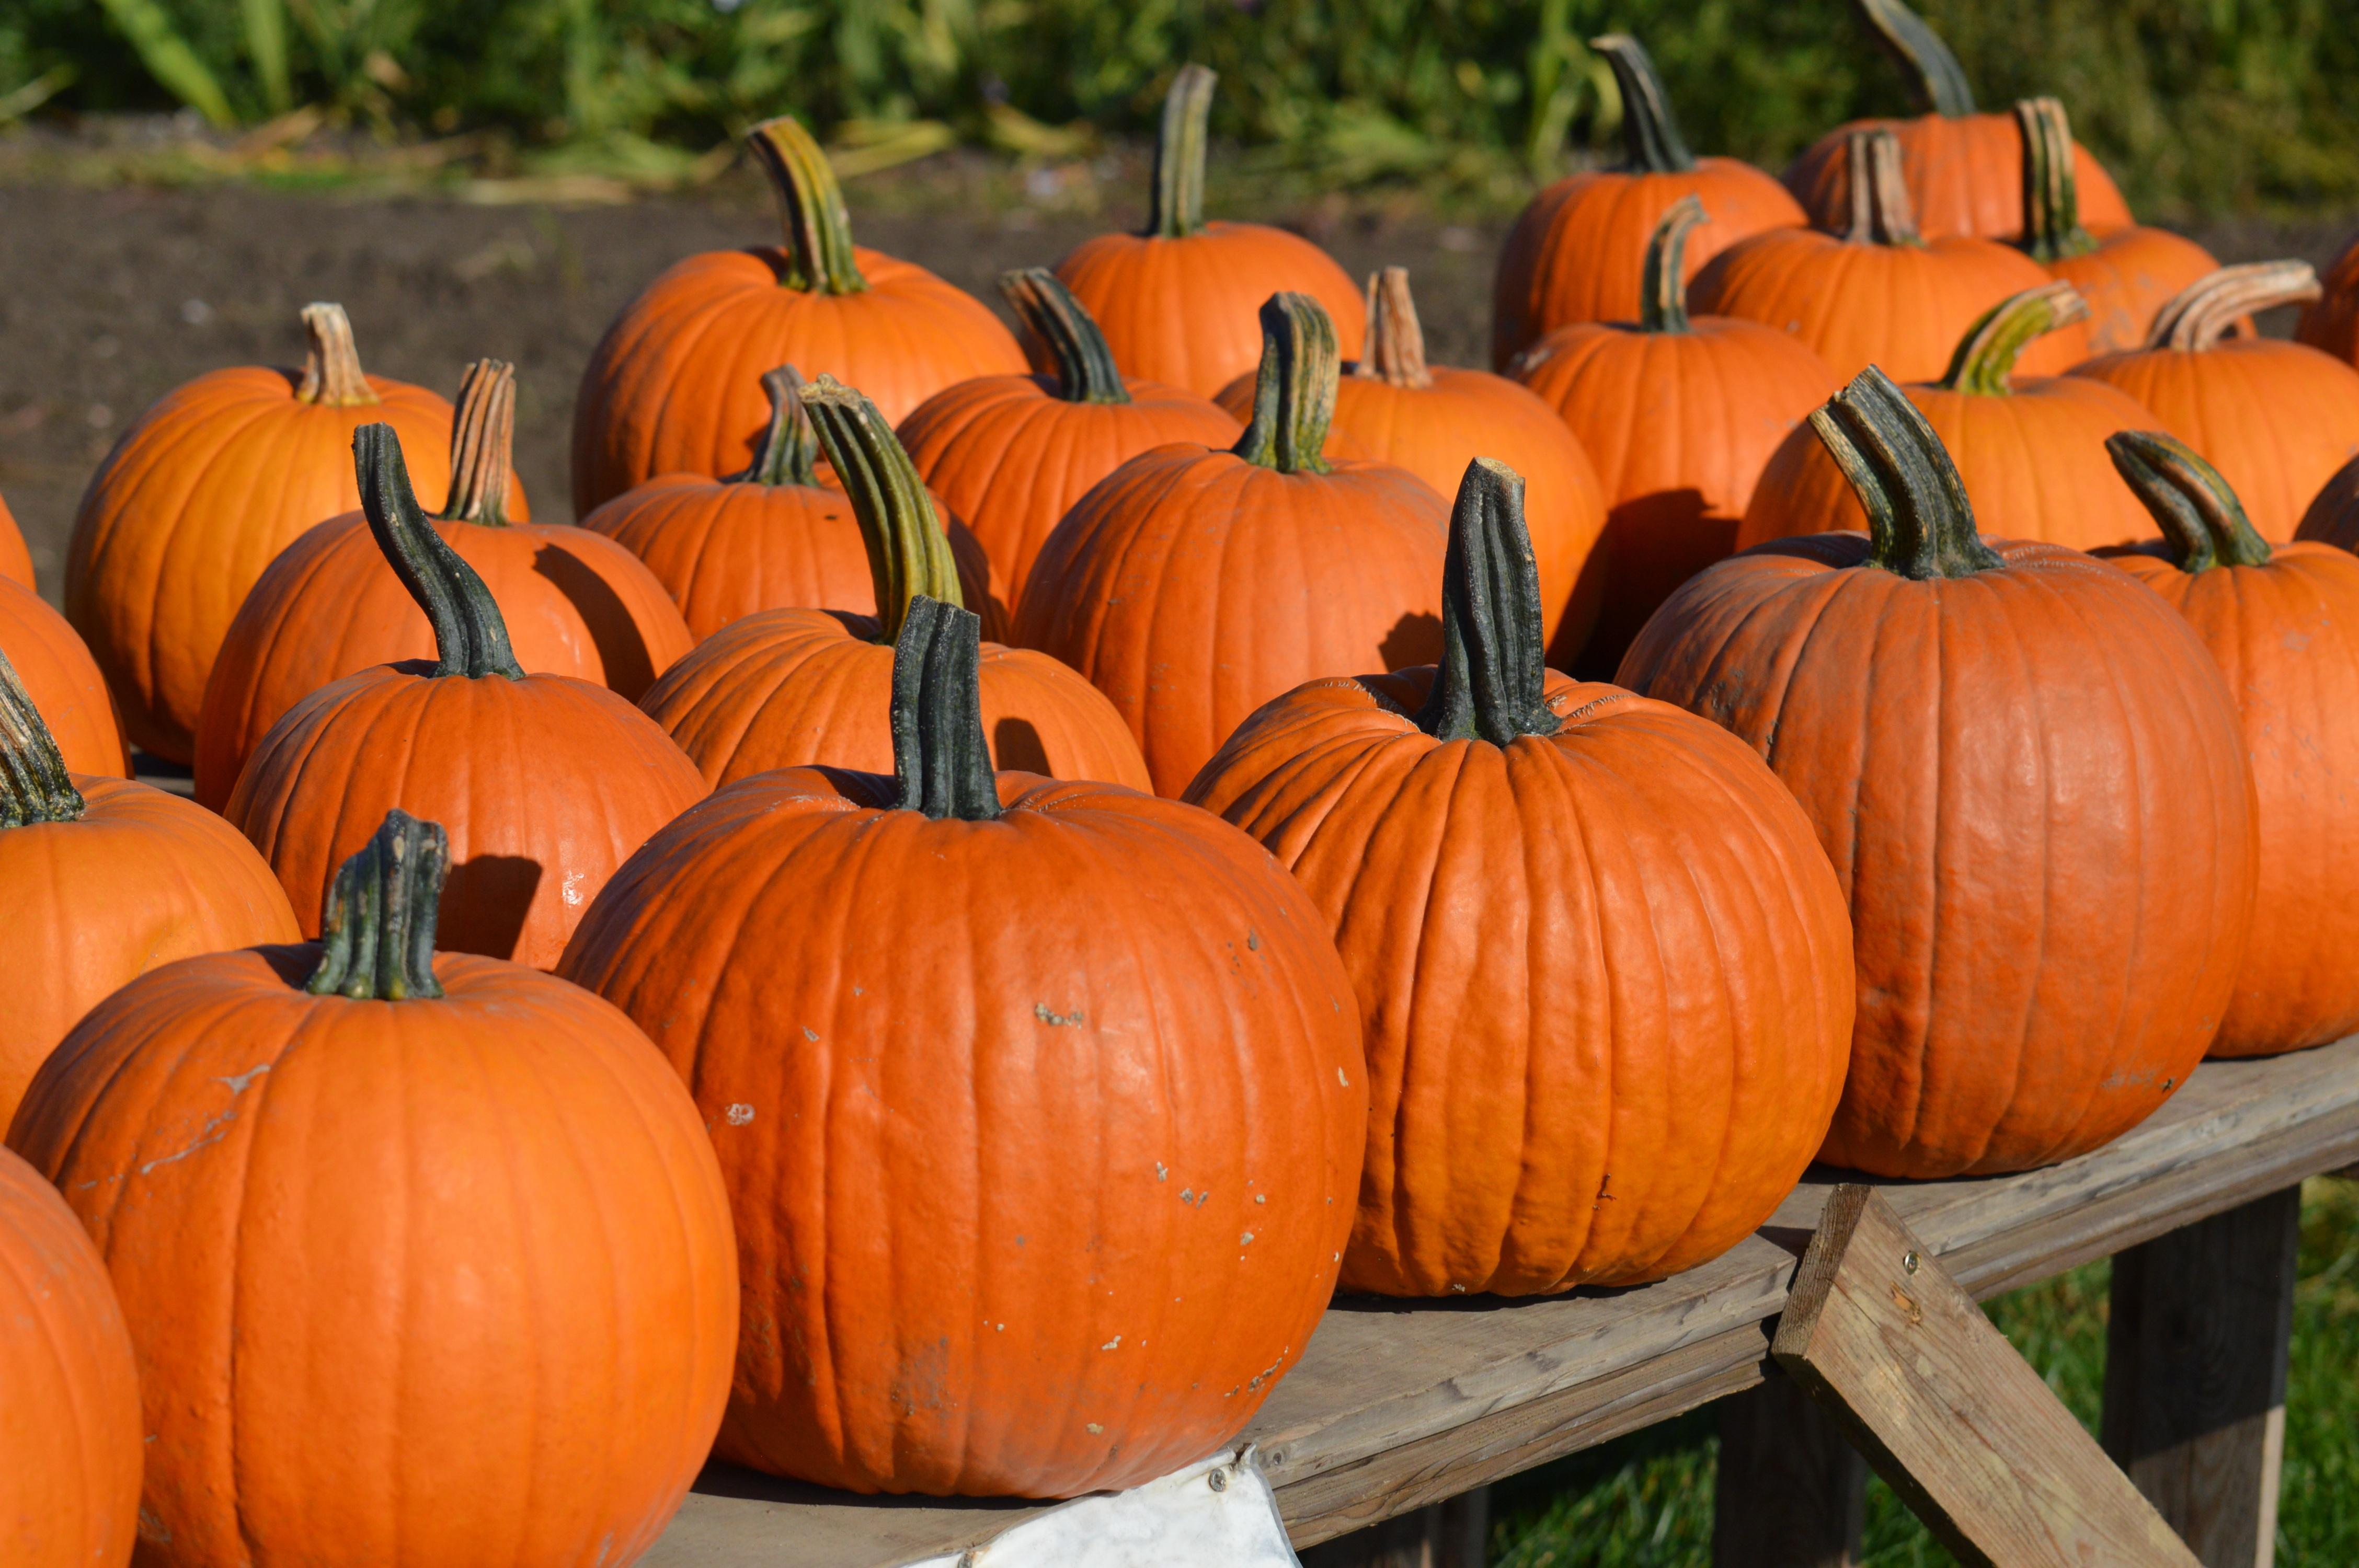 Gambar Jeruk Menghasilkan Musim Gugur Halloween Kundur